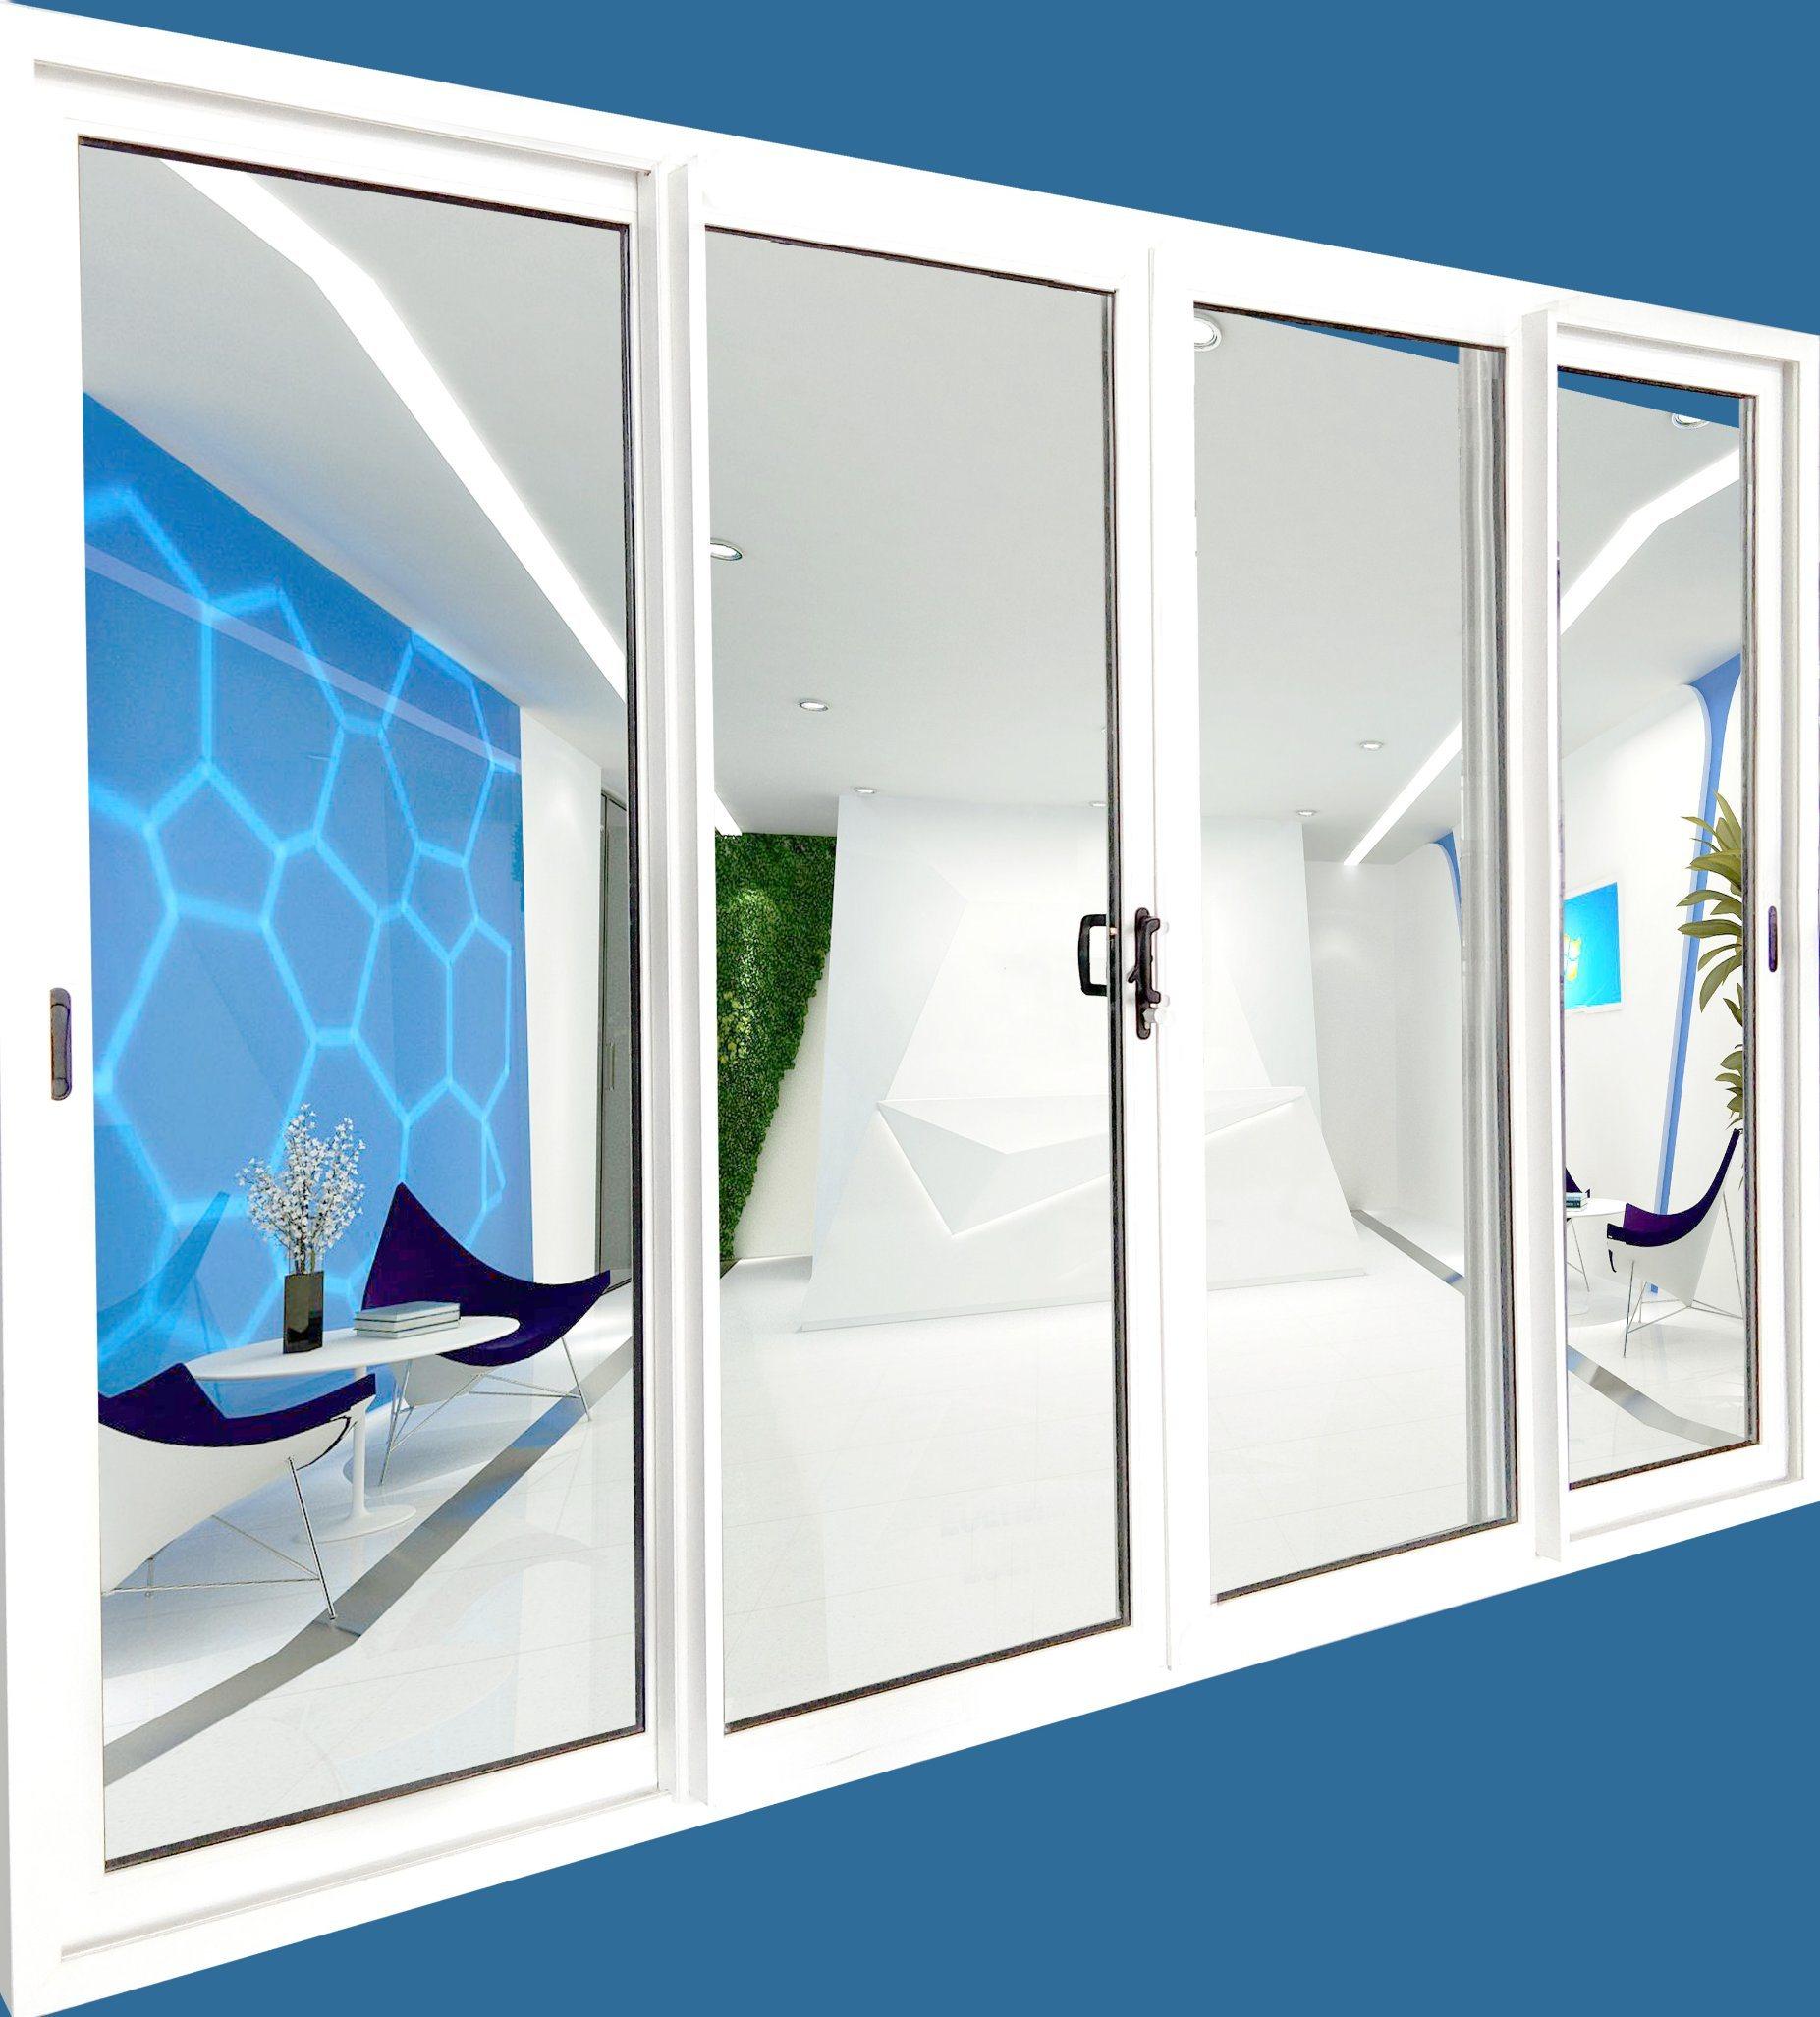 china door window plastic inserts air